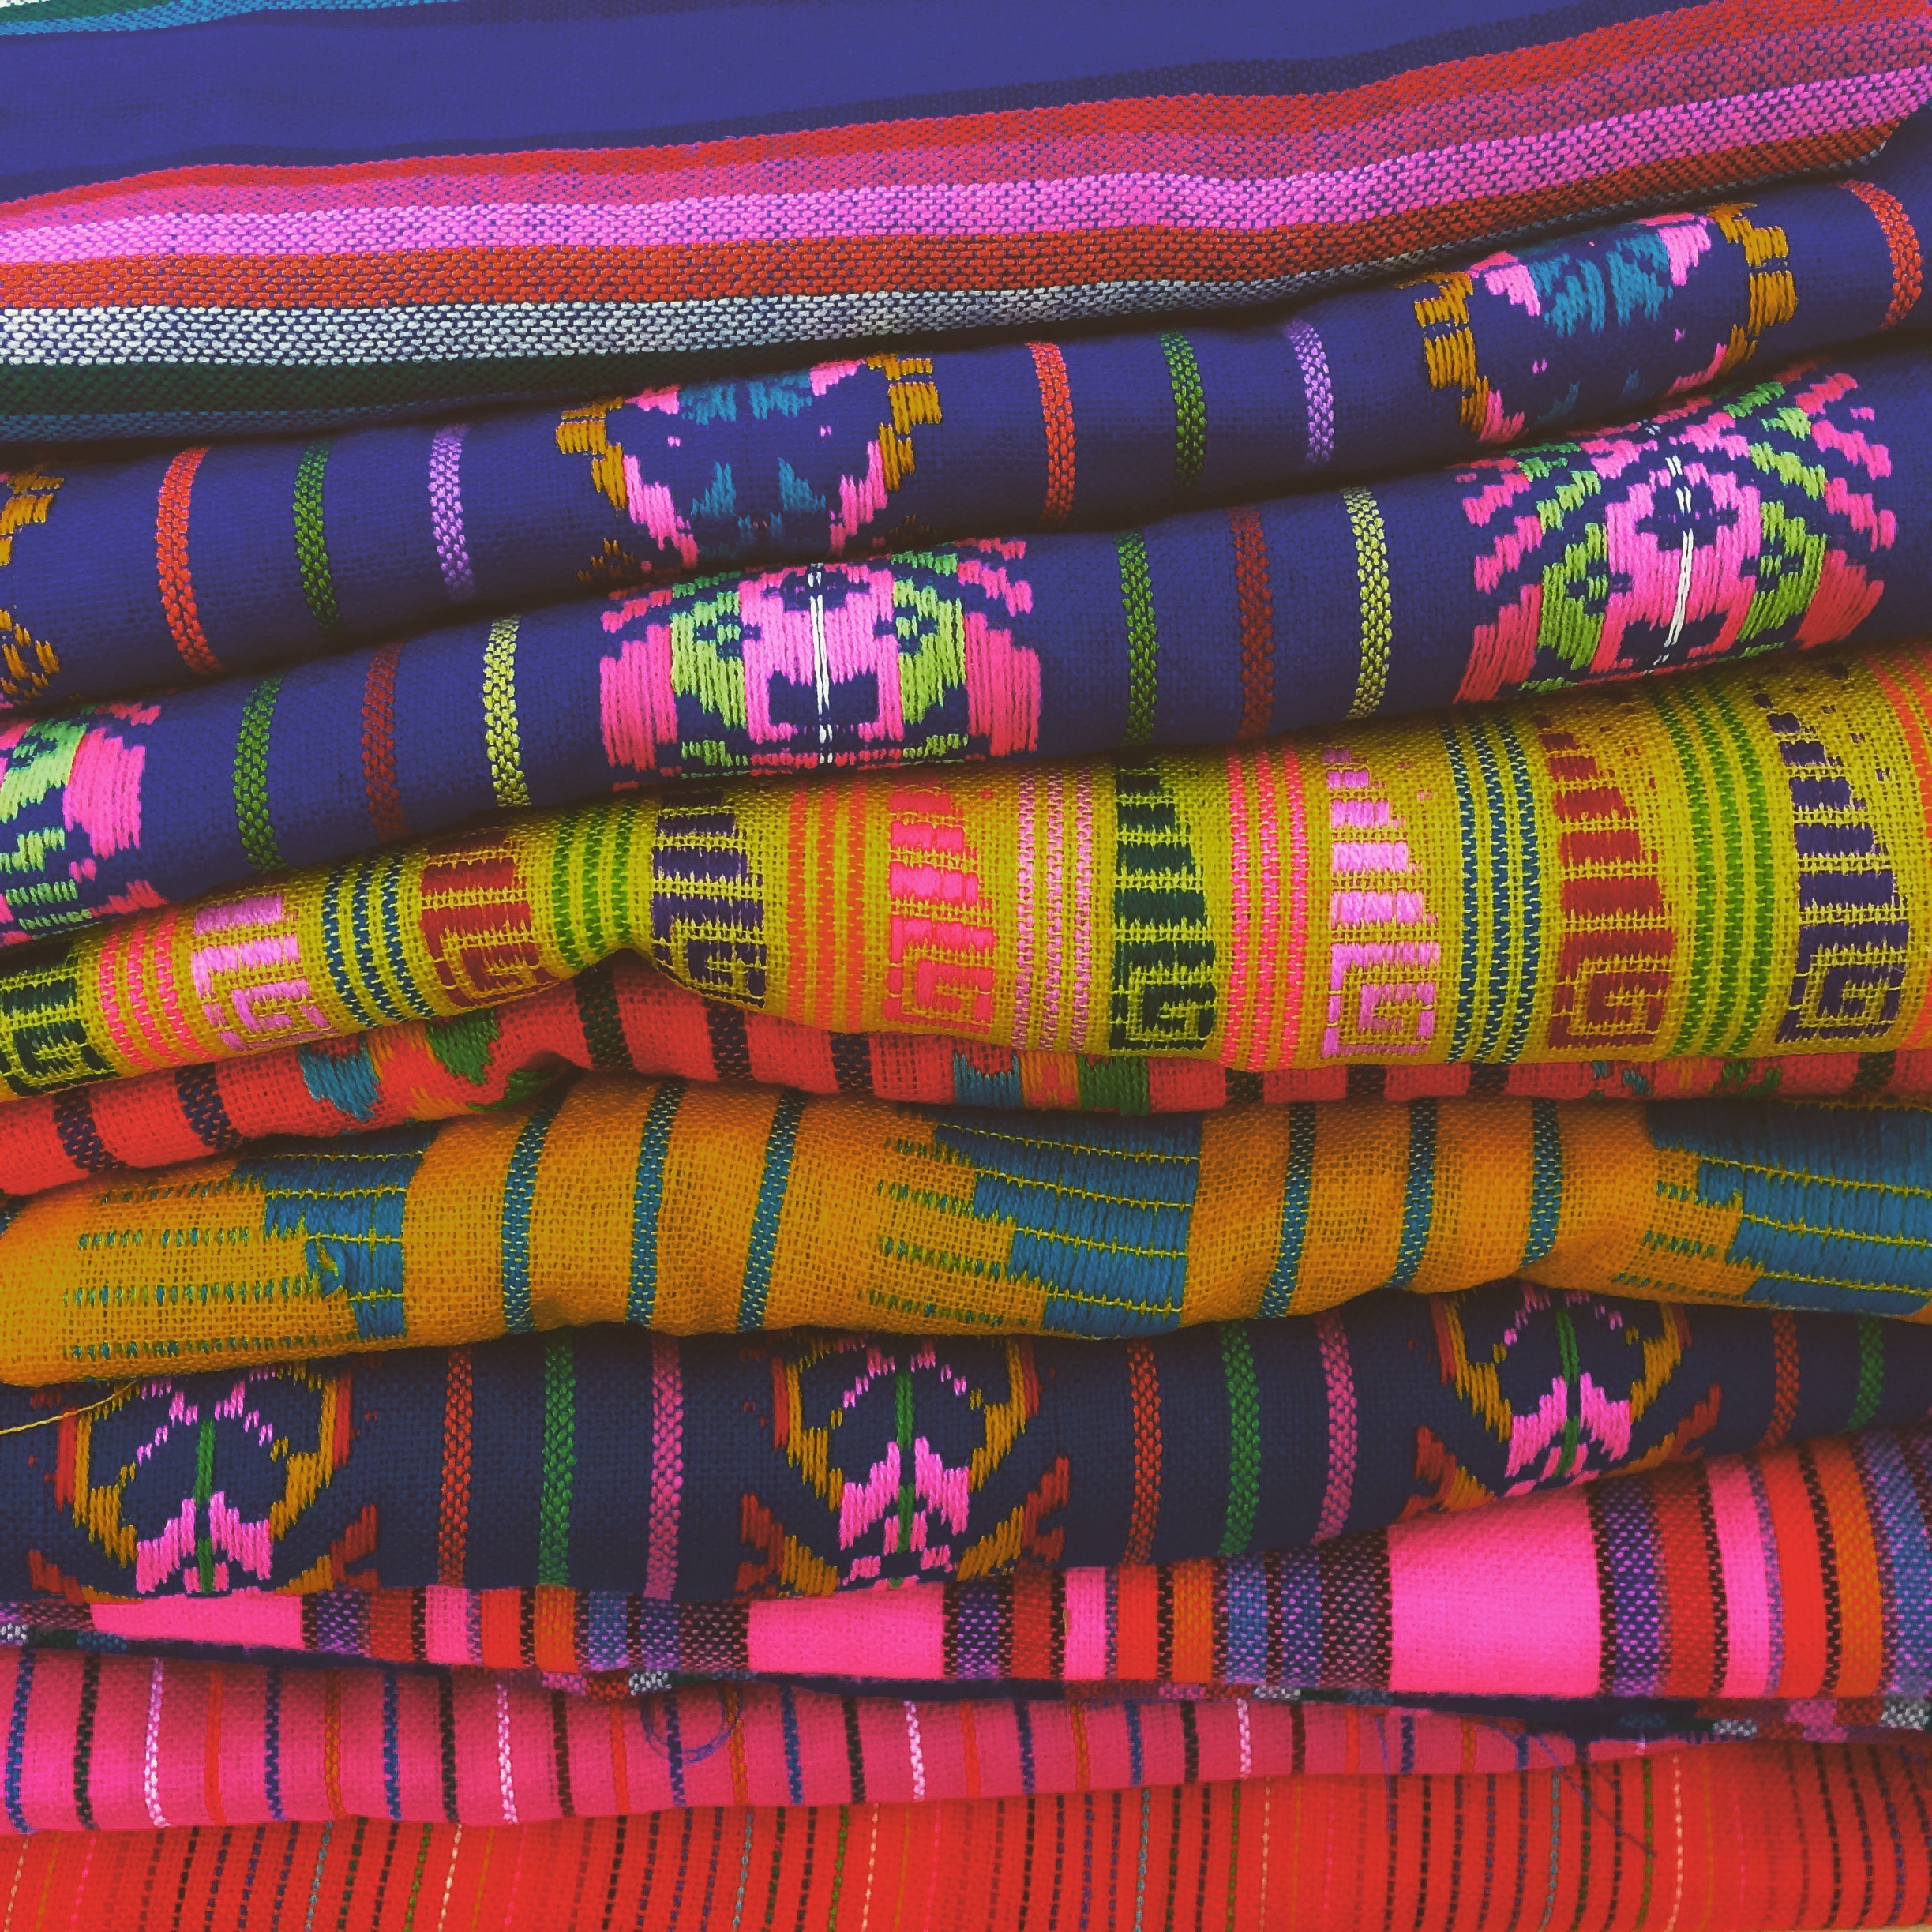 Cultura de Color  Oaxaca, Mexico  2015  Rebel Betty Arte